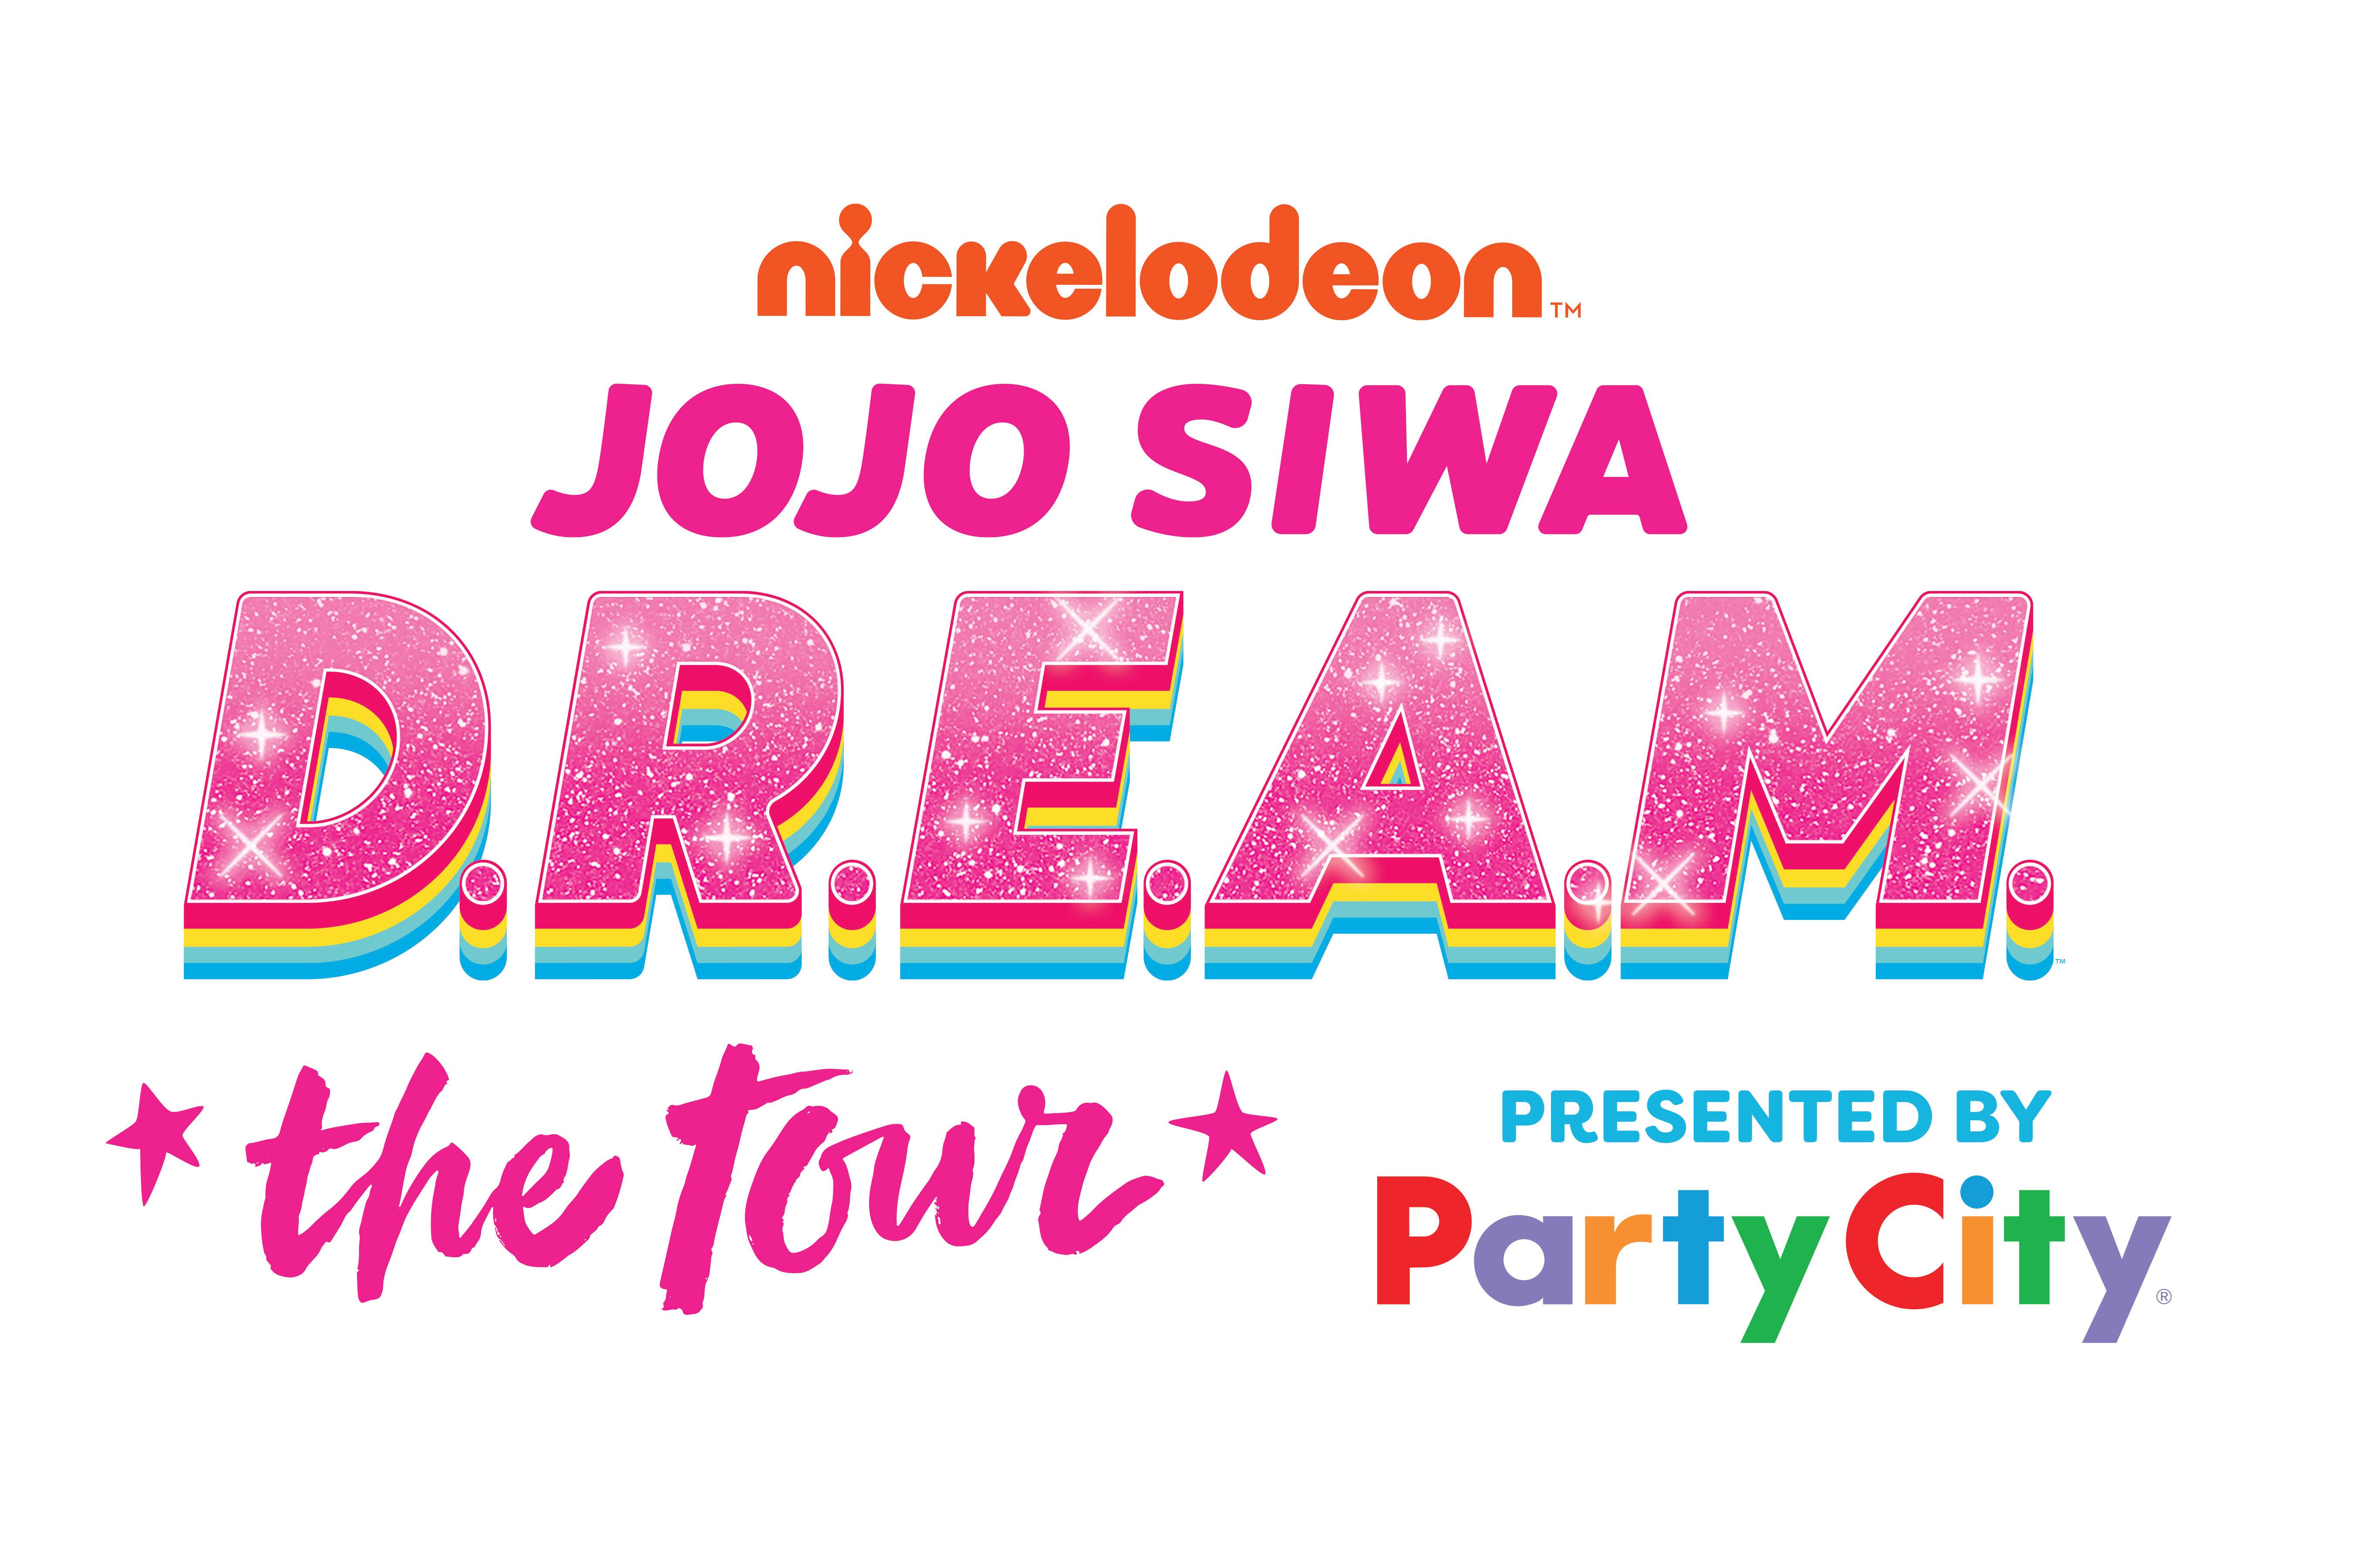 16df18a836 JoJo Siwa Adds 28 More Dates to Nickelodeon's JoJo Siwa D.R.E.A.M. ...